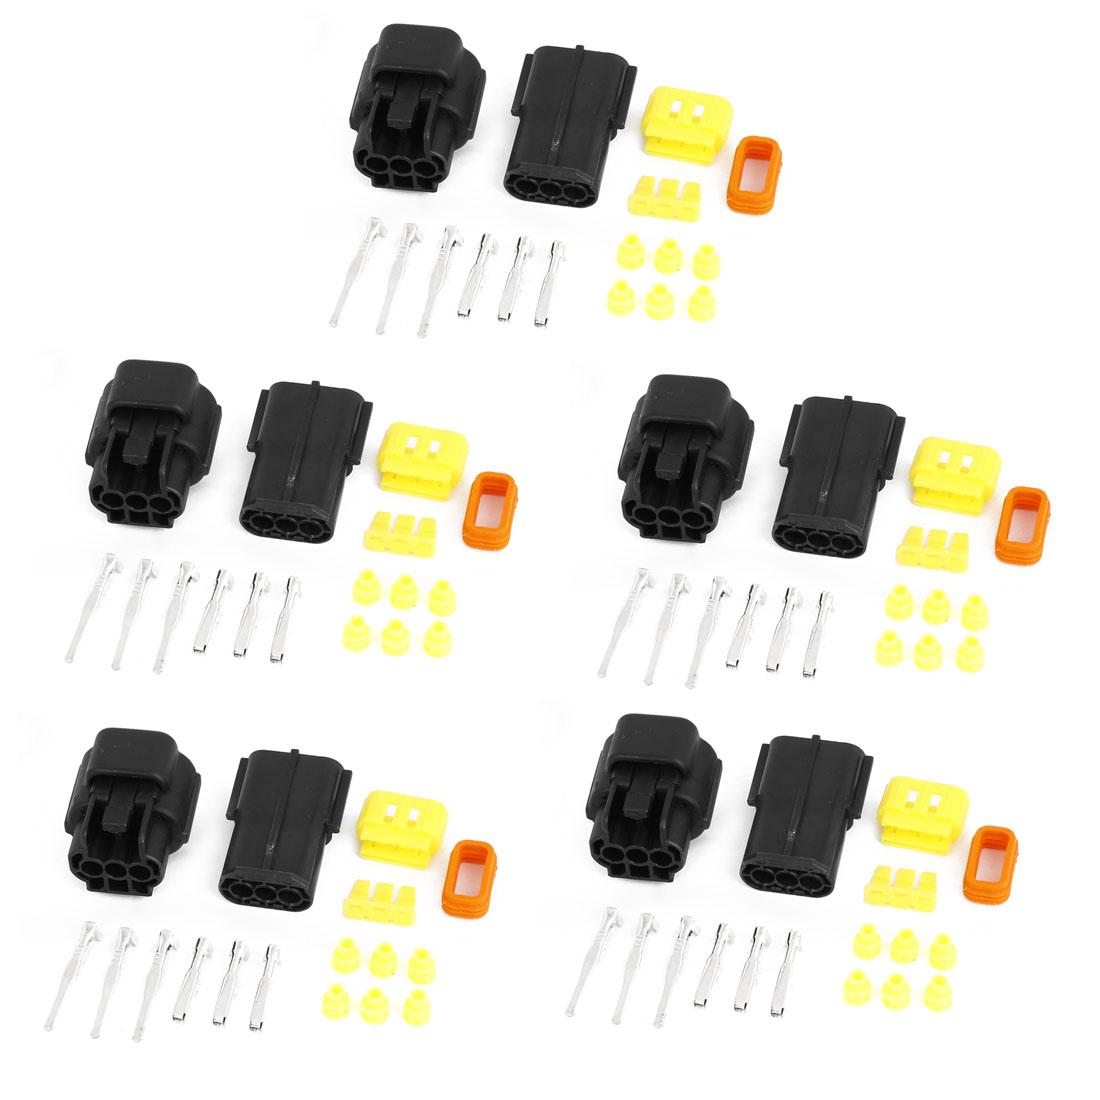 Unique Bargains 5 x Set 3 Pin Waterproof Connector 3 Way Connector Car Scooter ATV UTV RV